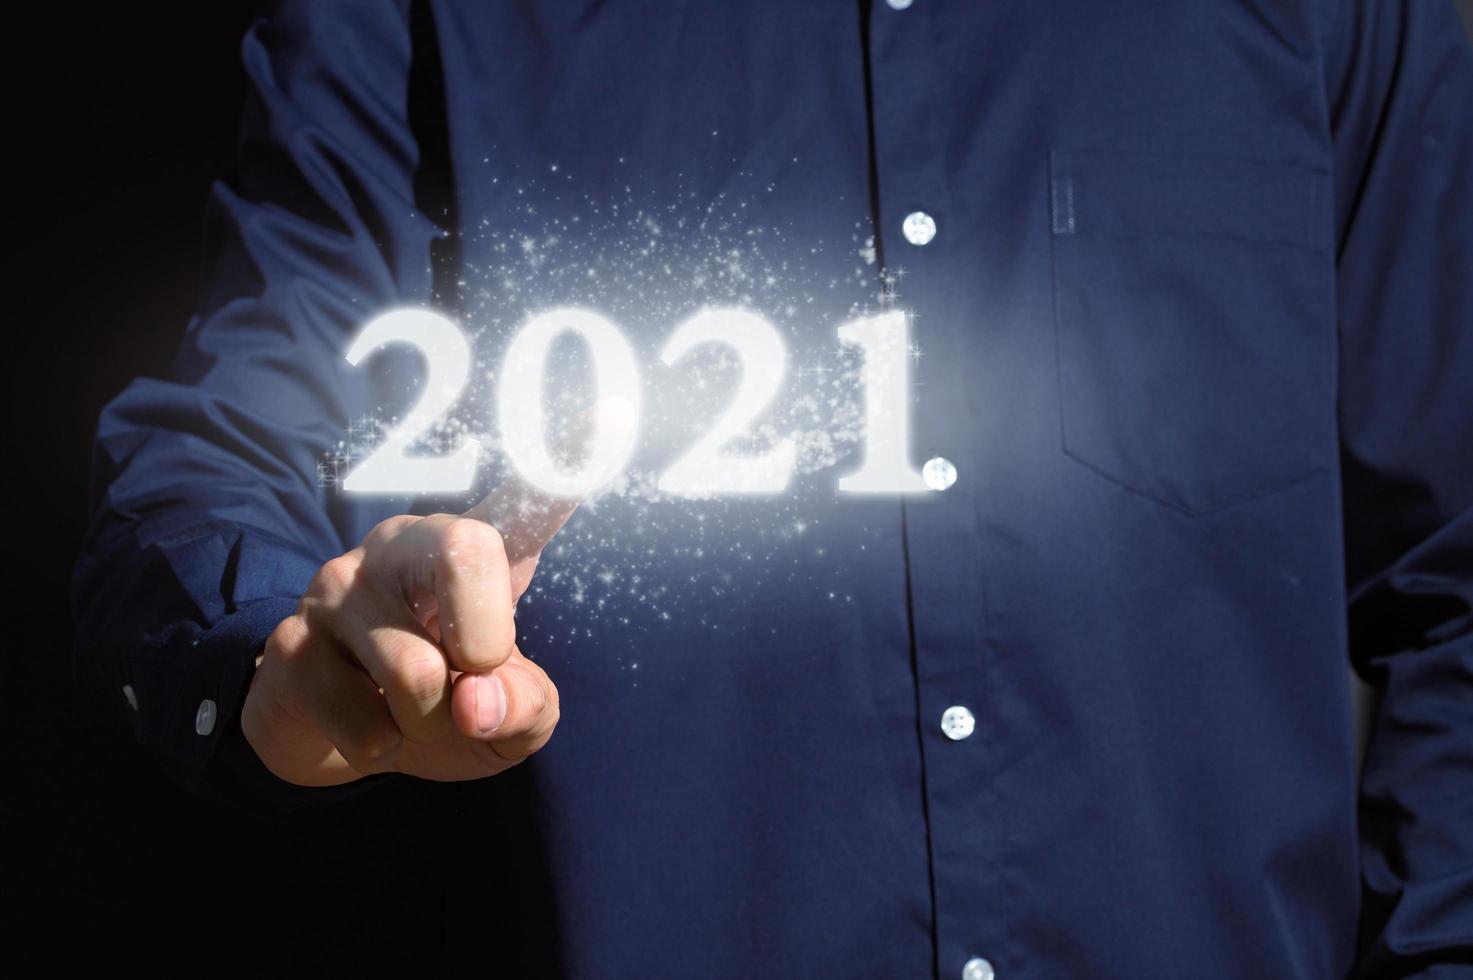 Human hand and 2021 inscription photo